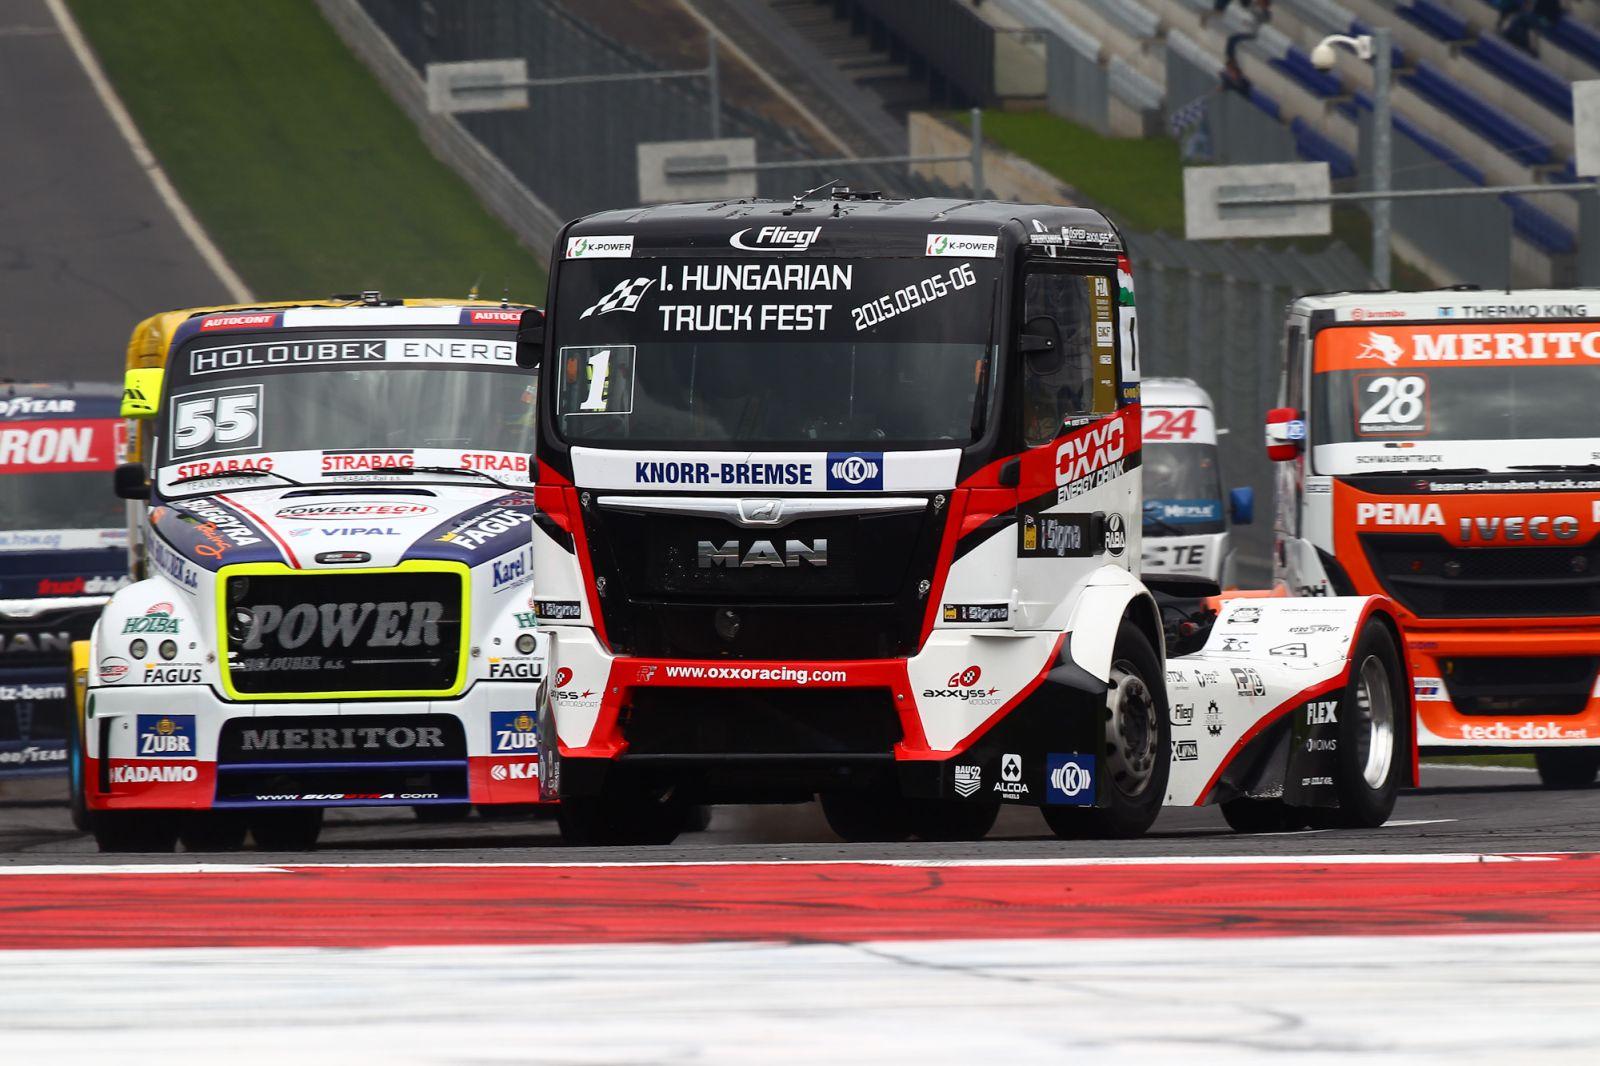 Kamion verseny a Hungaroringen - nyugat krónika